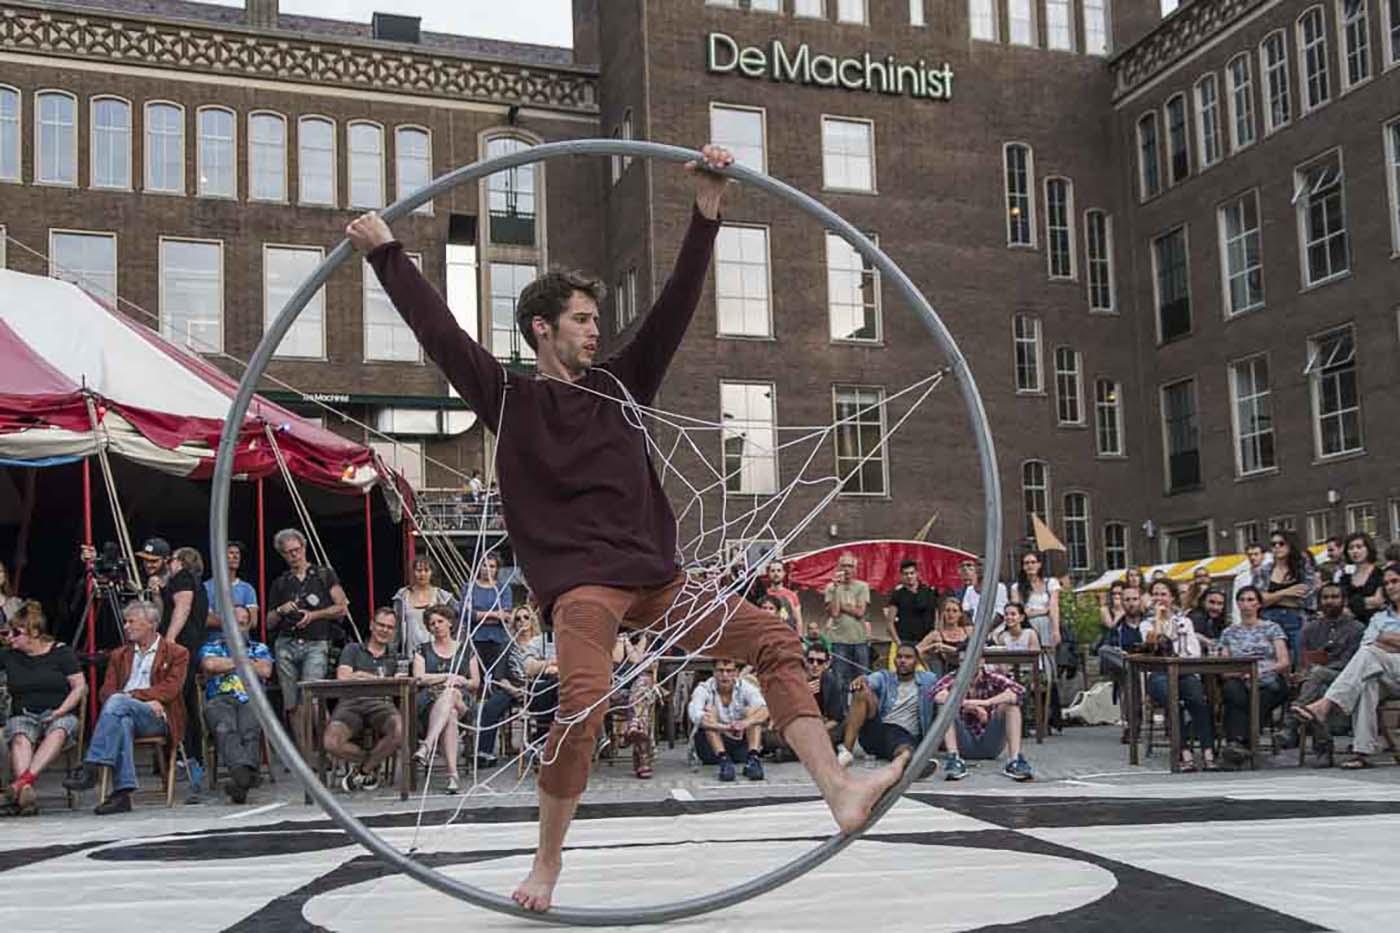 Full-Moon-Babylon-@De-Machinist-Rotterdam-020617-5098